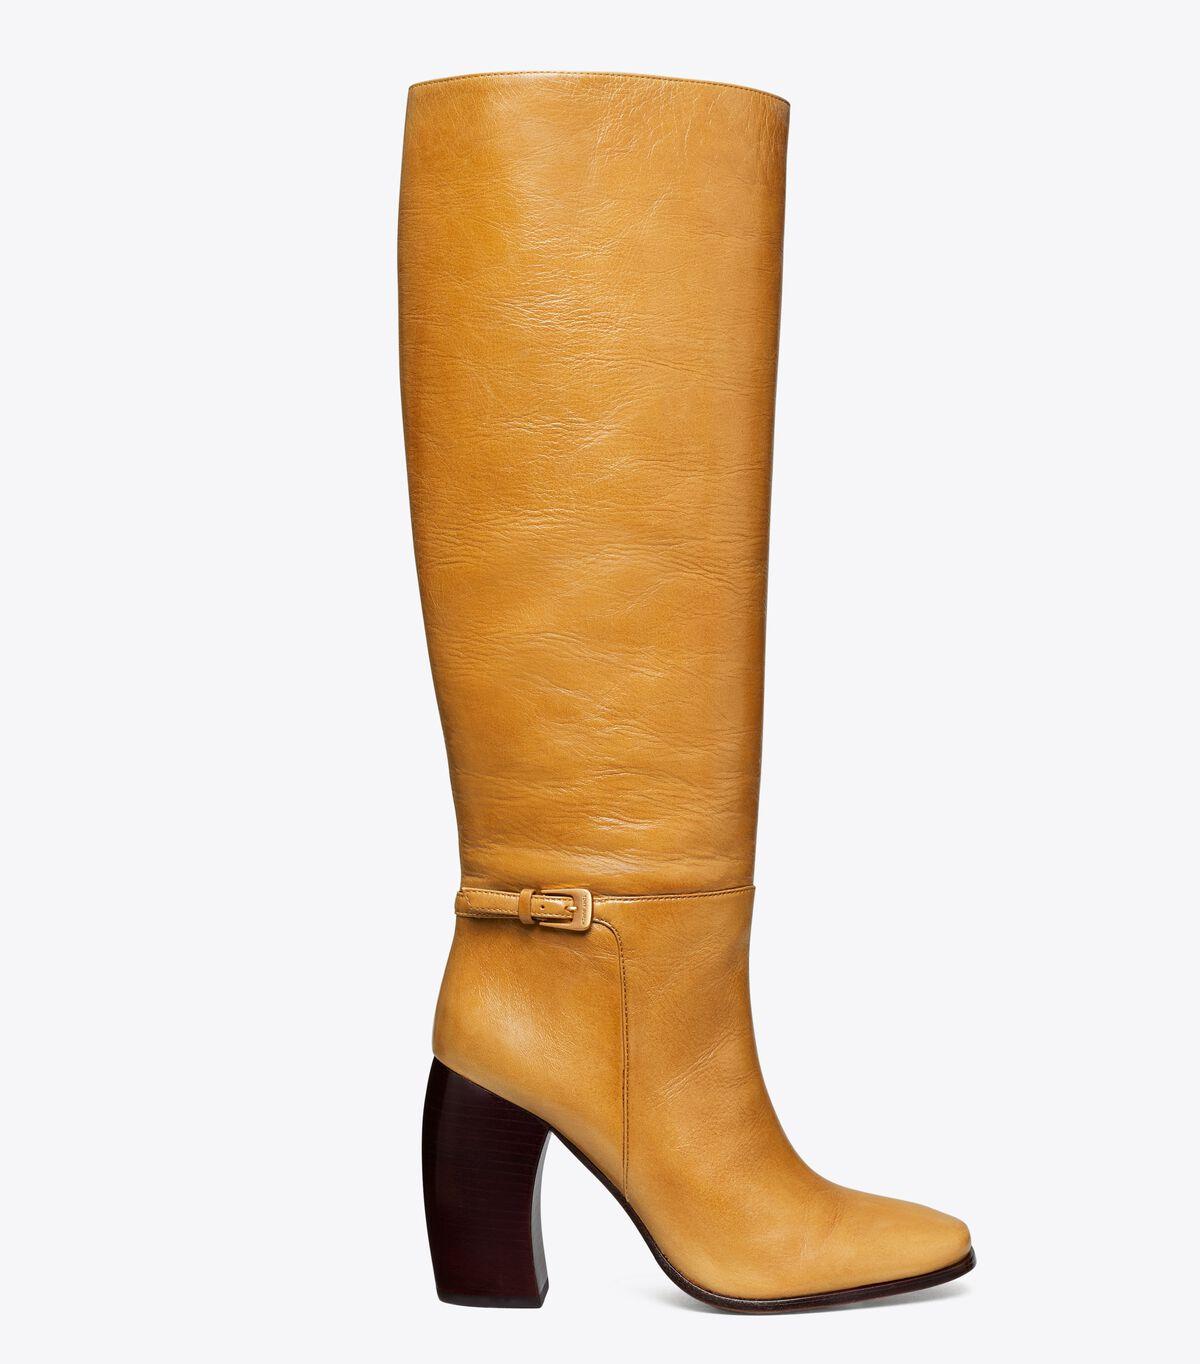 Banana Heel Boot